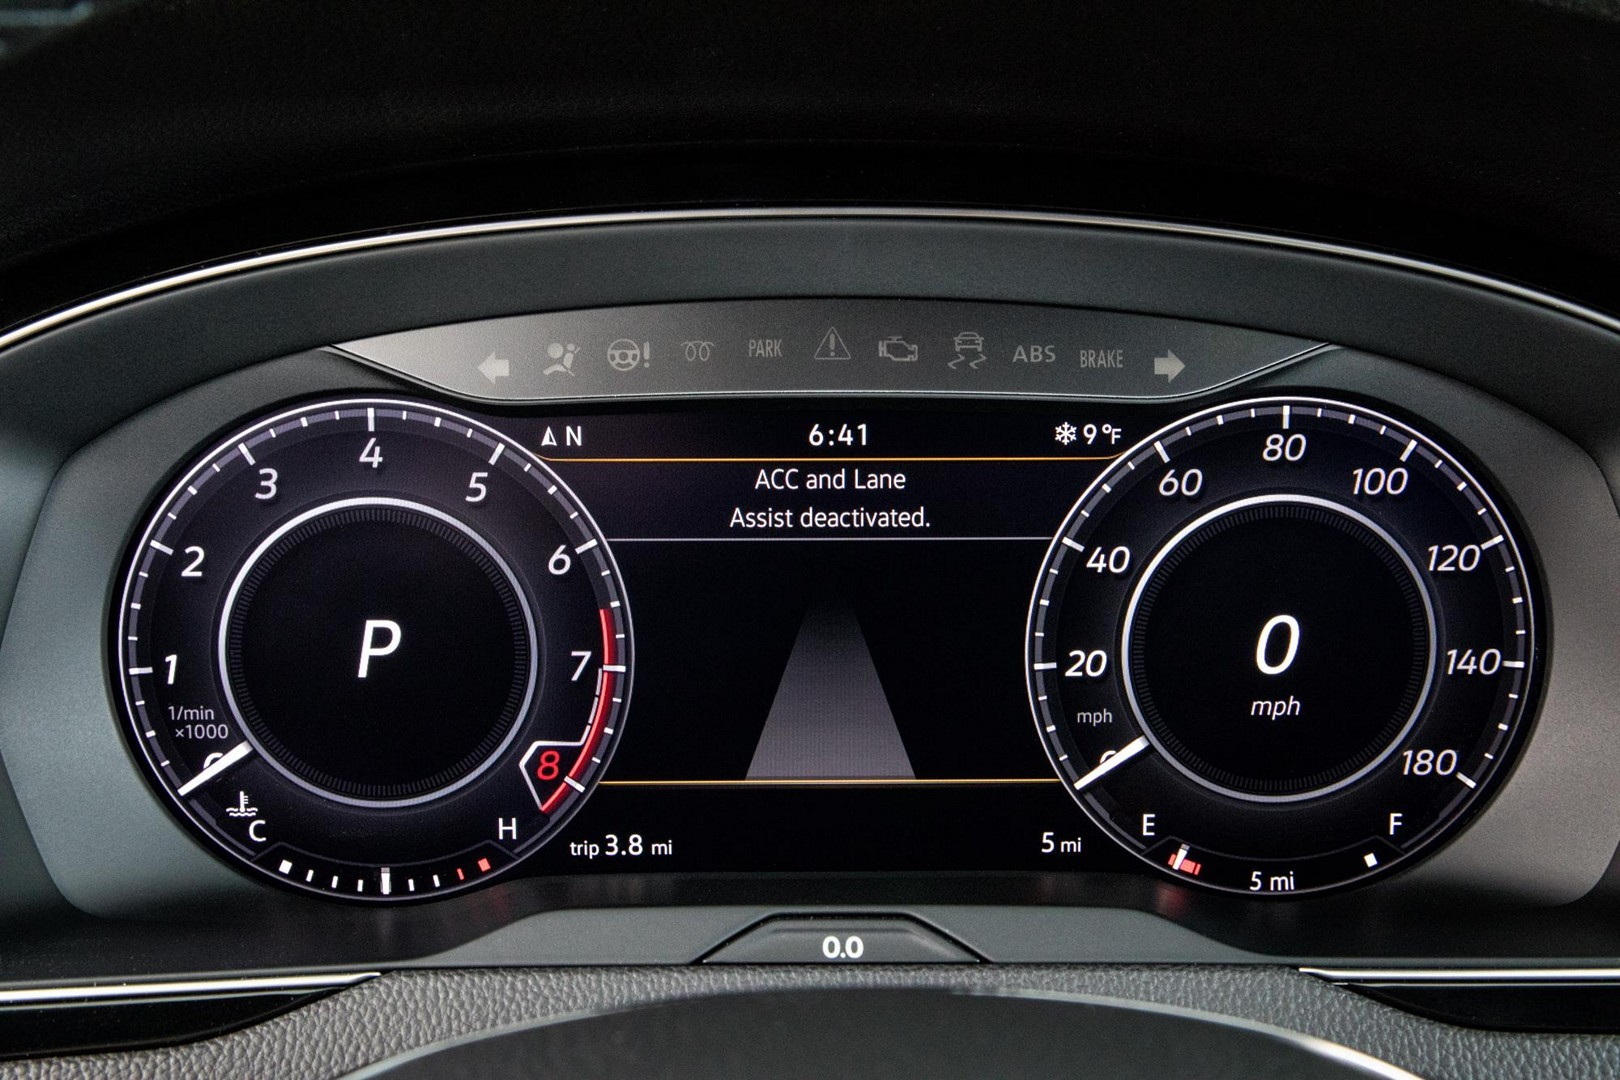 Vw Tiguan Coupe 2018 >> Volkswagen Built an Arteon V6 Prototype, Is Considering a Shooting Brake - autoevolution